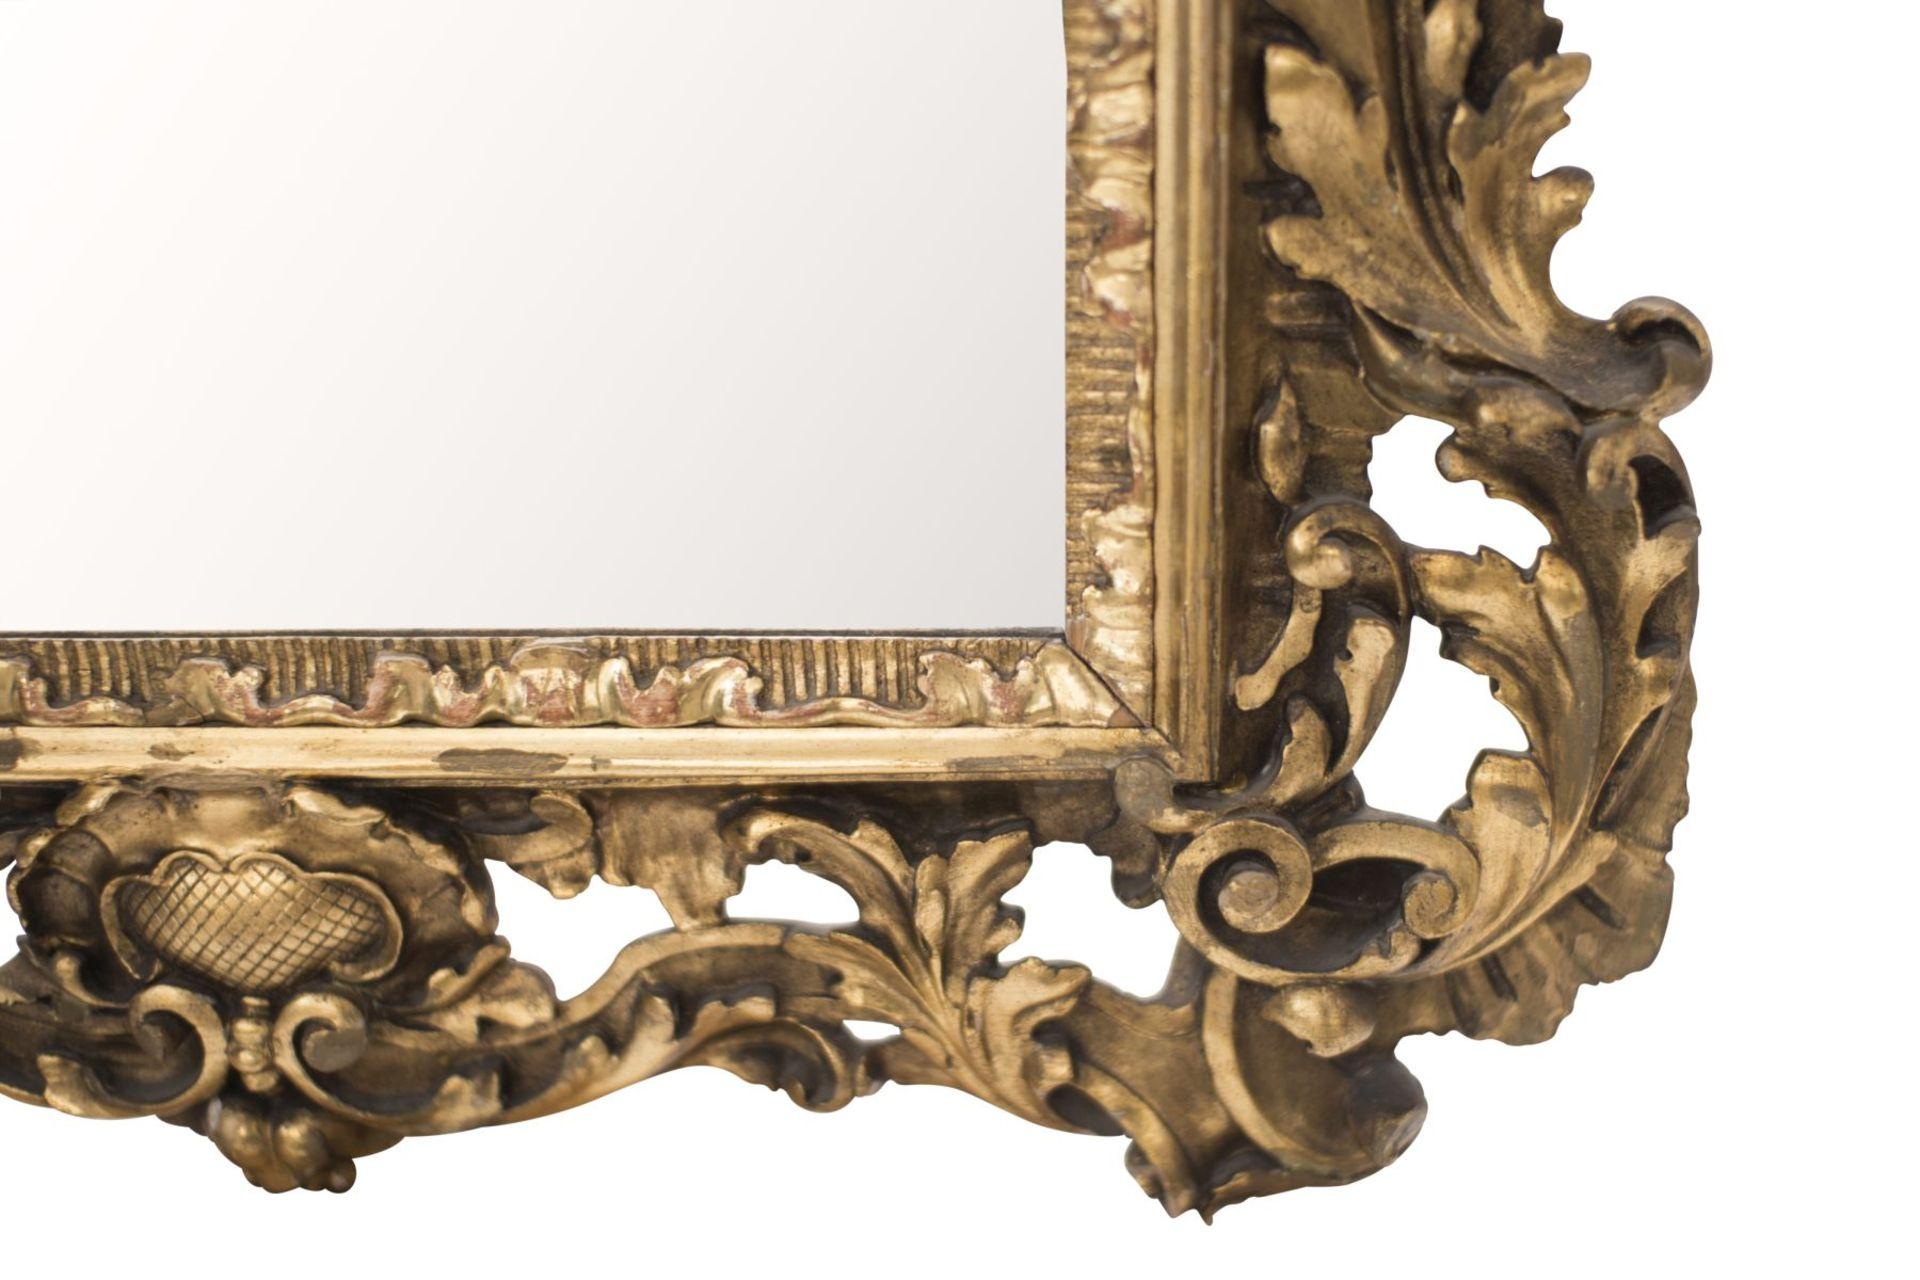 Baroque style salon mirror, 19th century - Image 5 of 6